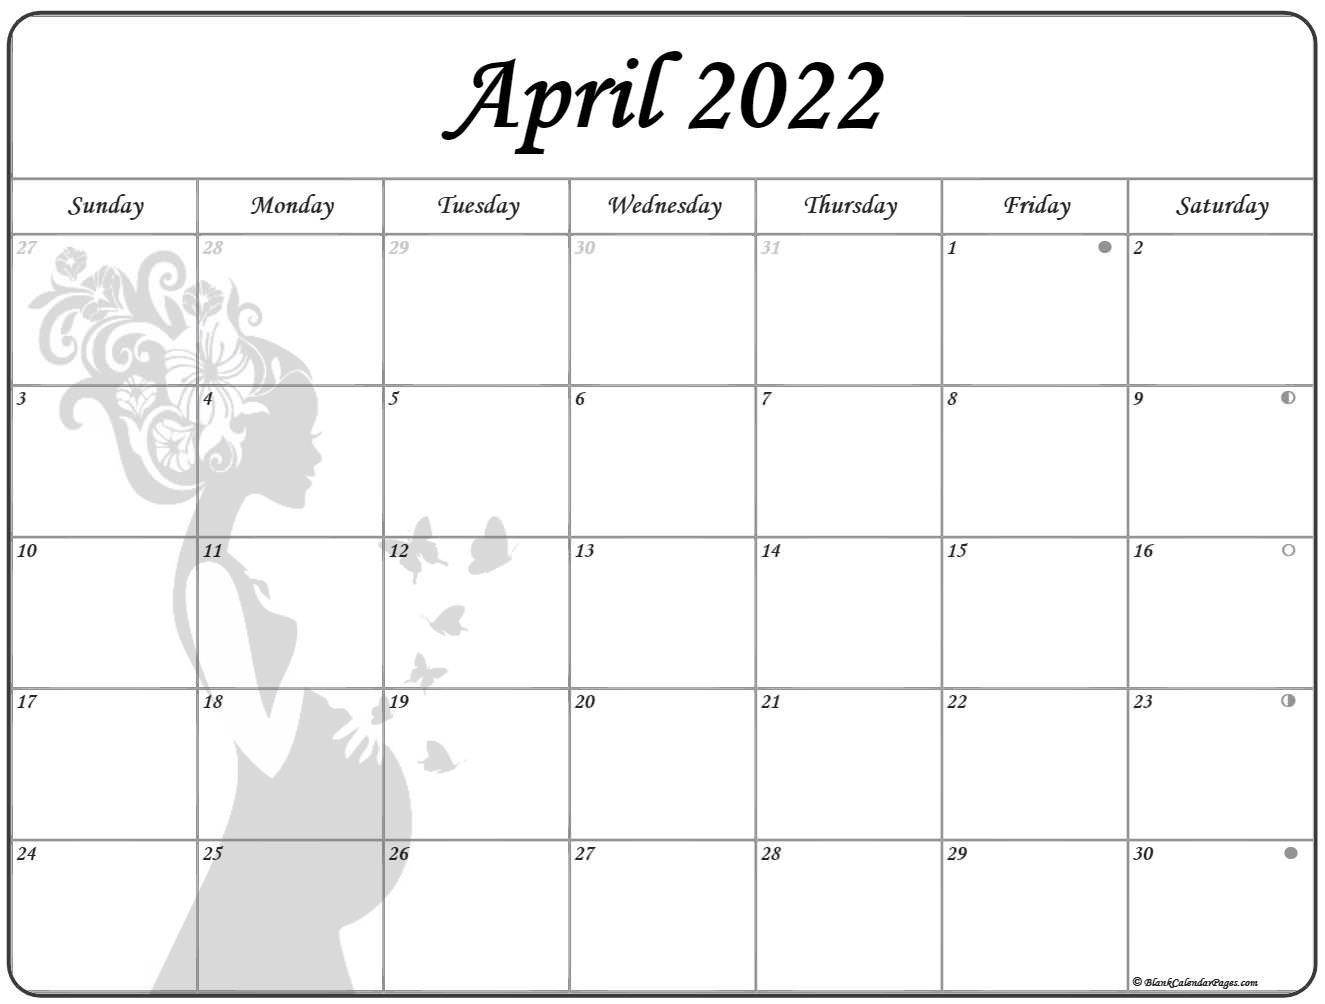 April 2022 Pregnancy Calendar | Fertility Calendar inside Printable April 2022 Calendar